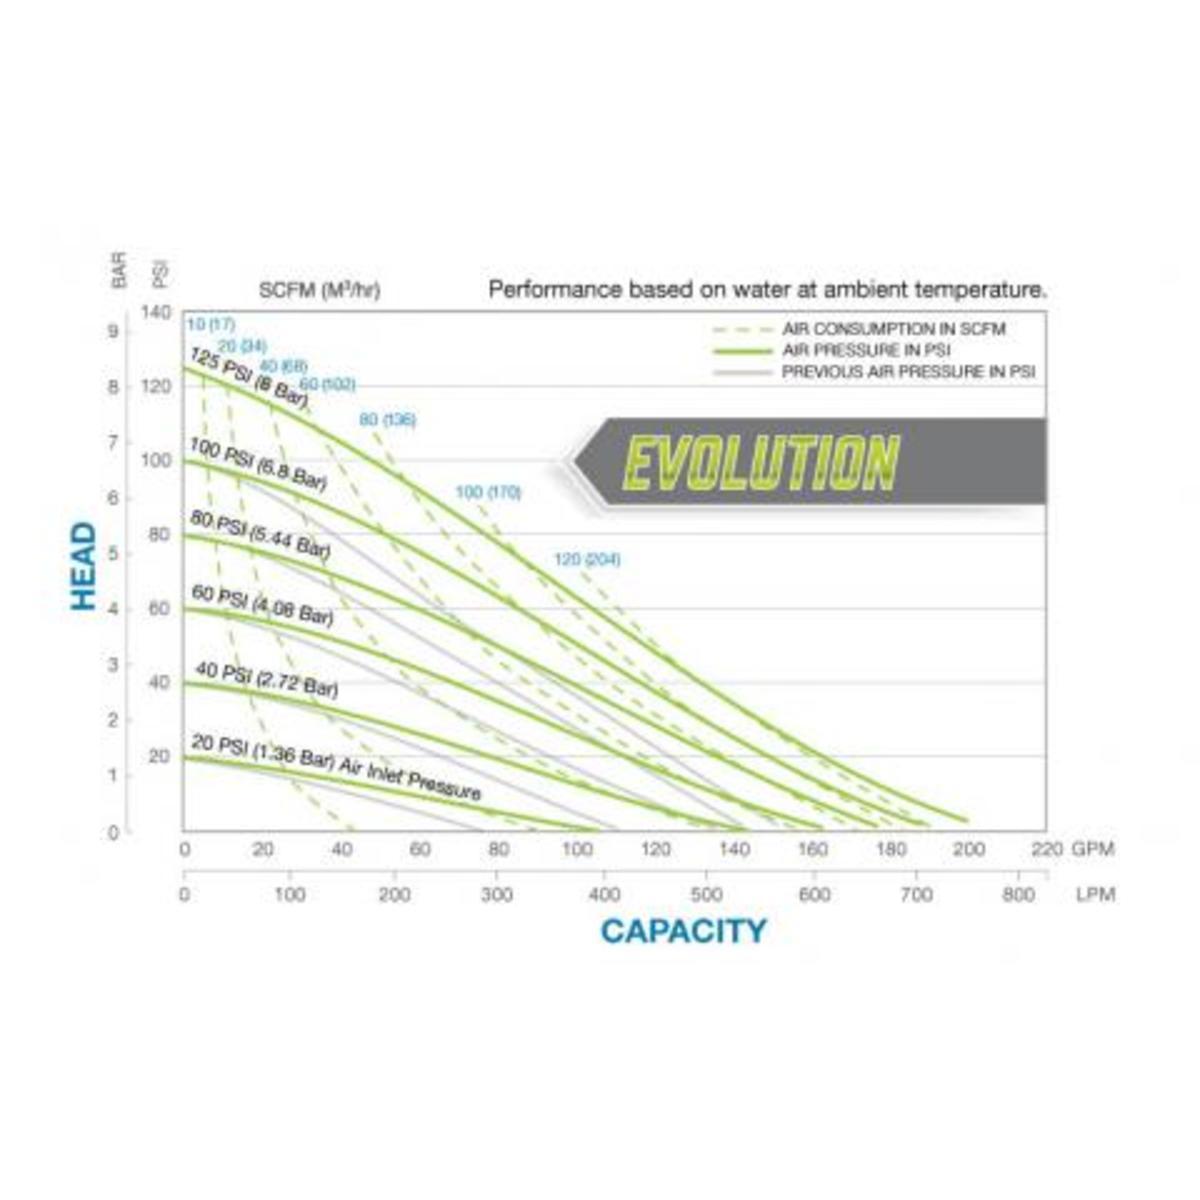 sandpiper-s20m-evolution-0-curve.jpg